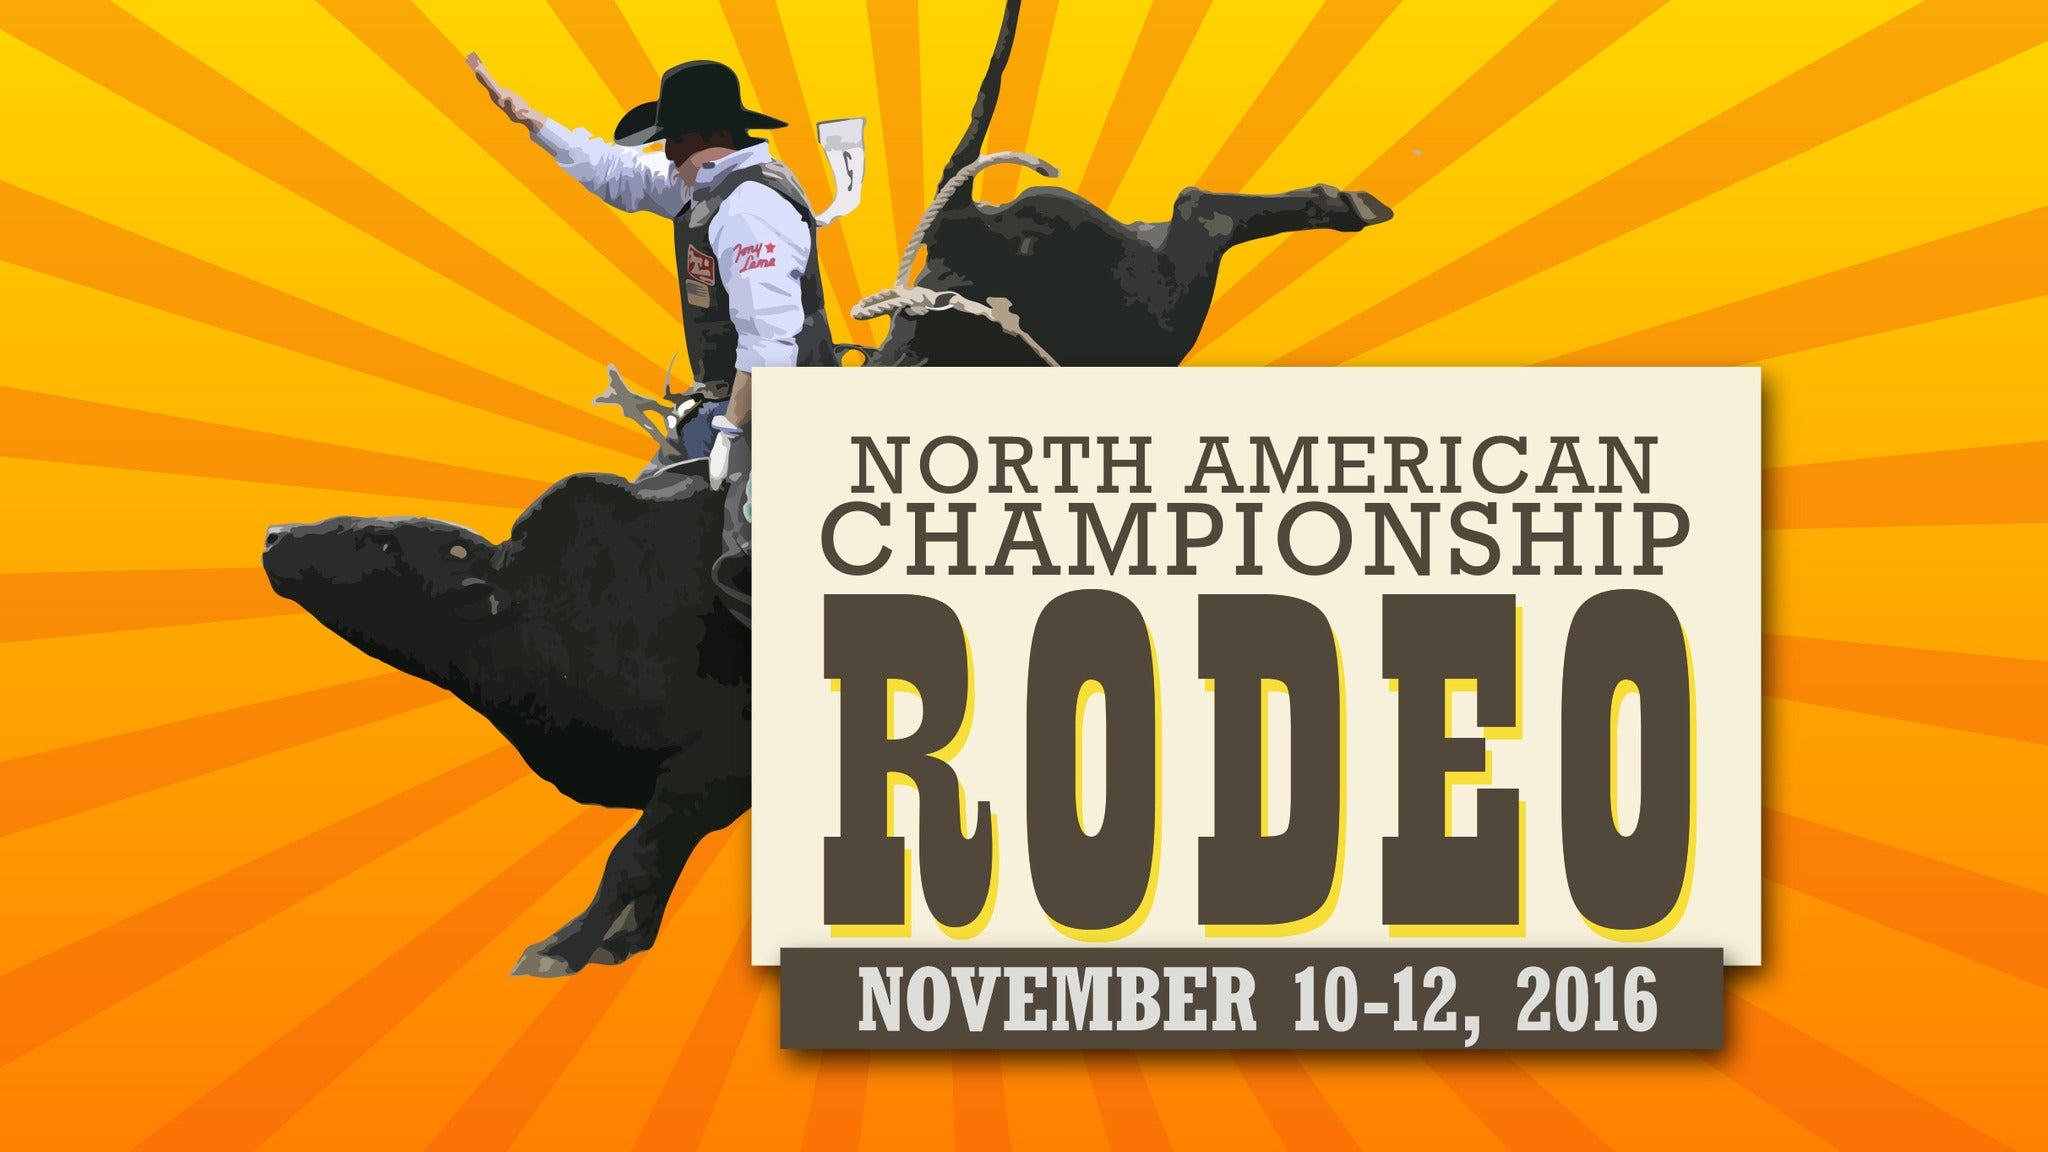 North American Championship Rodeo